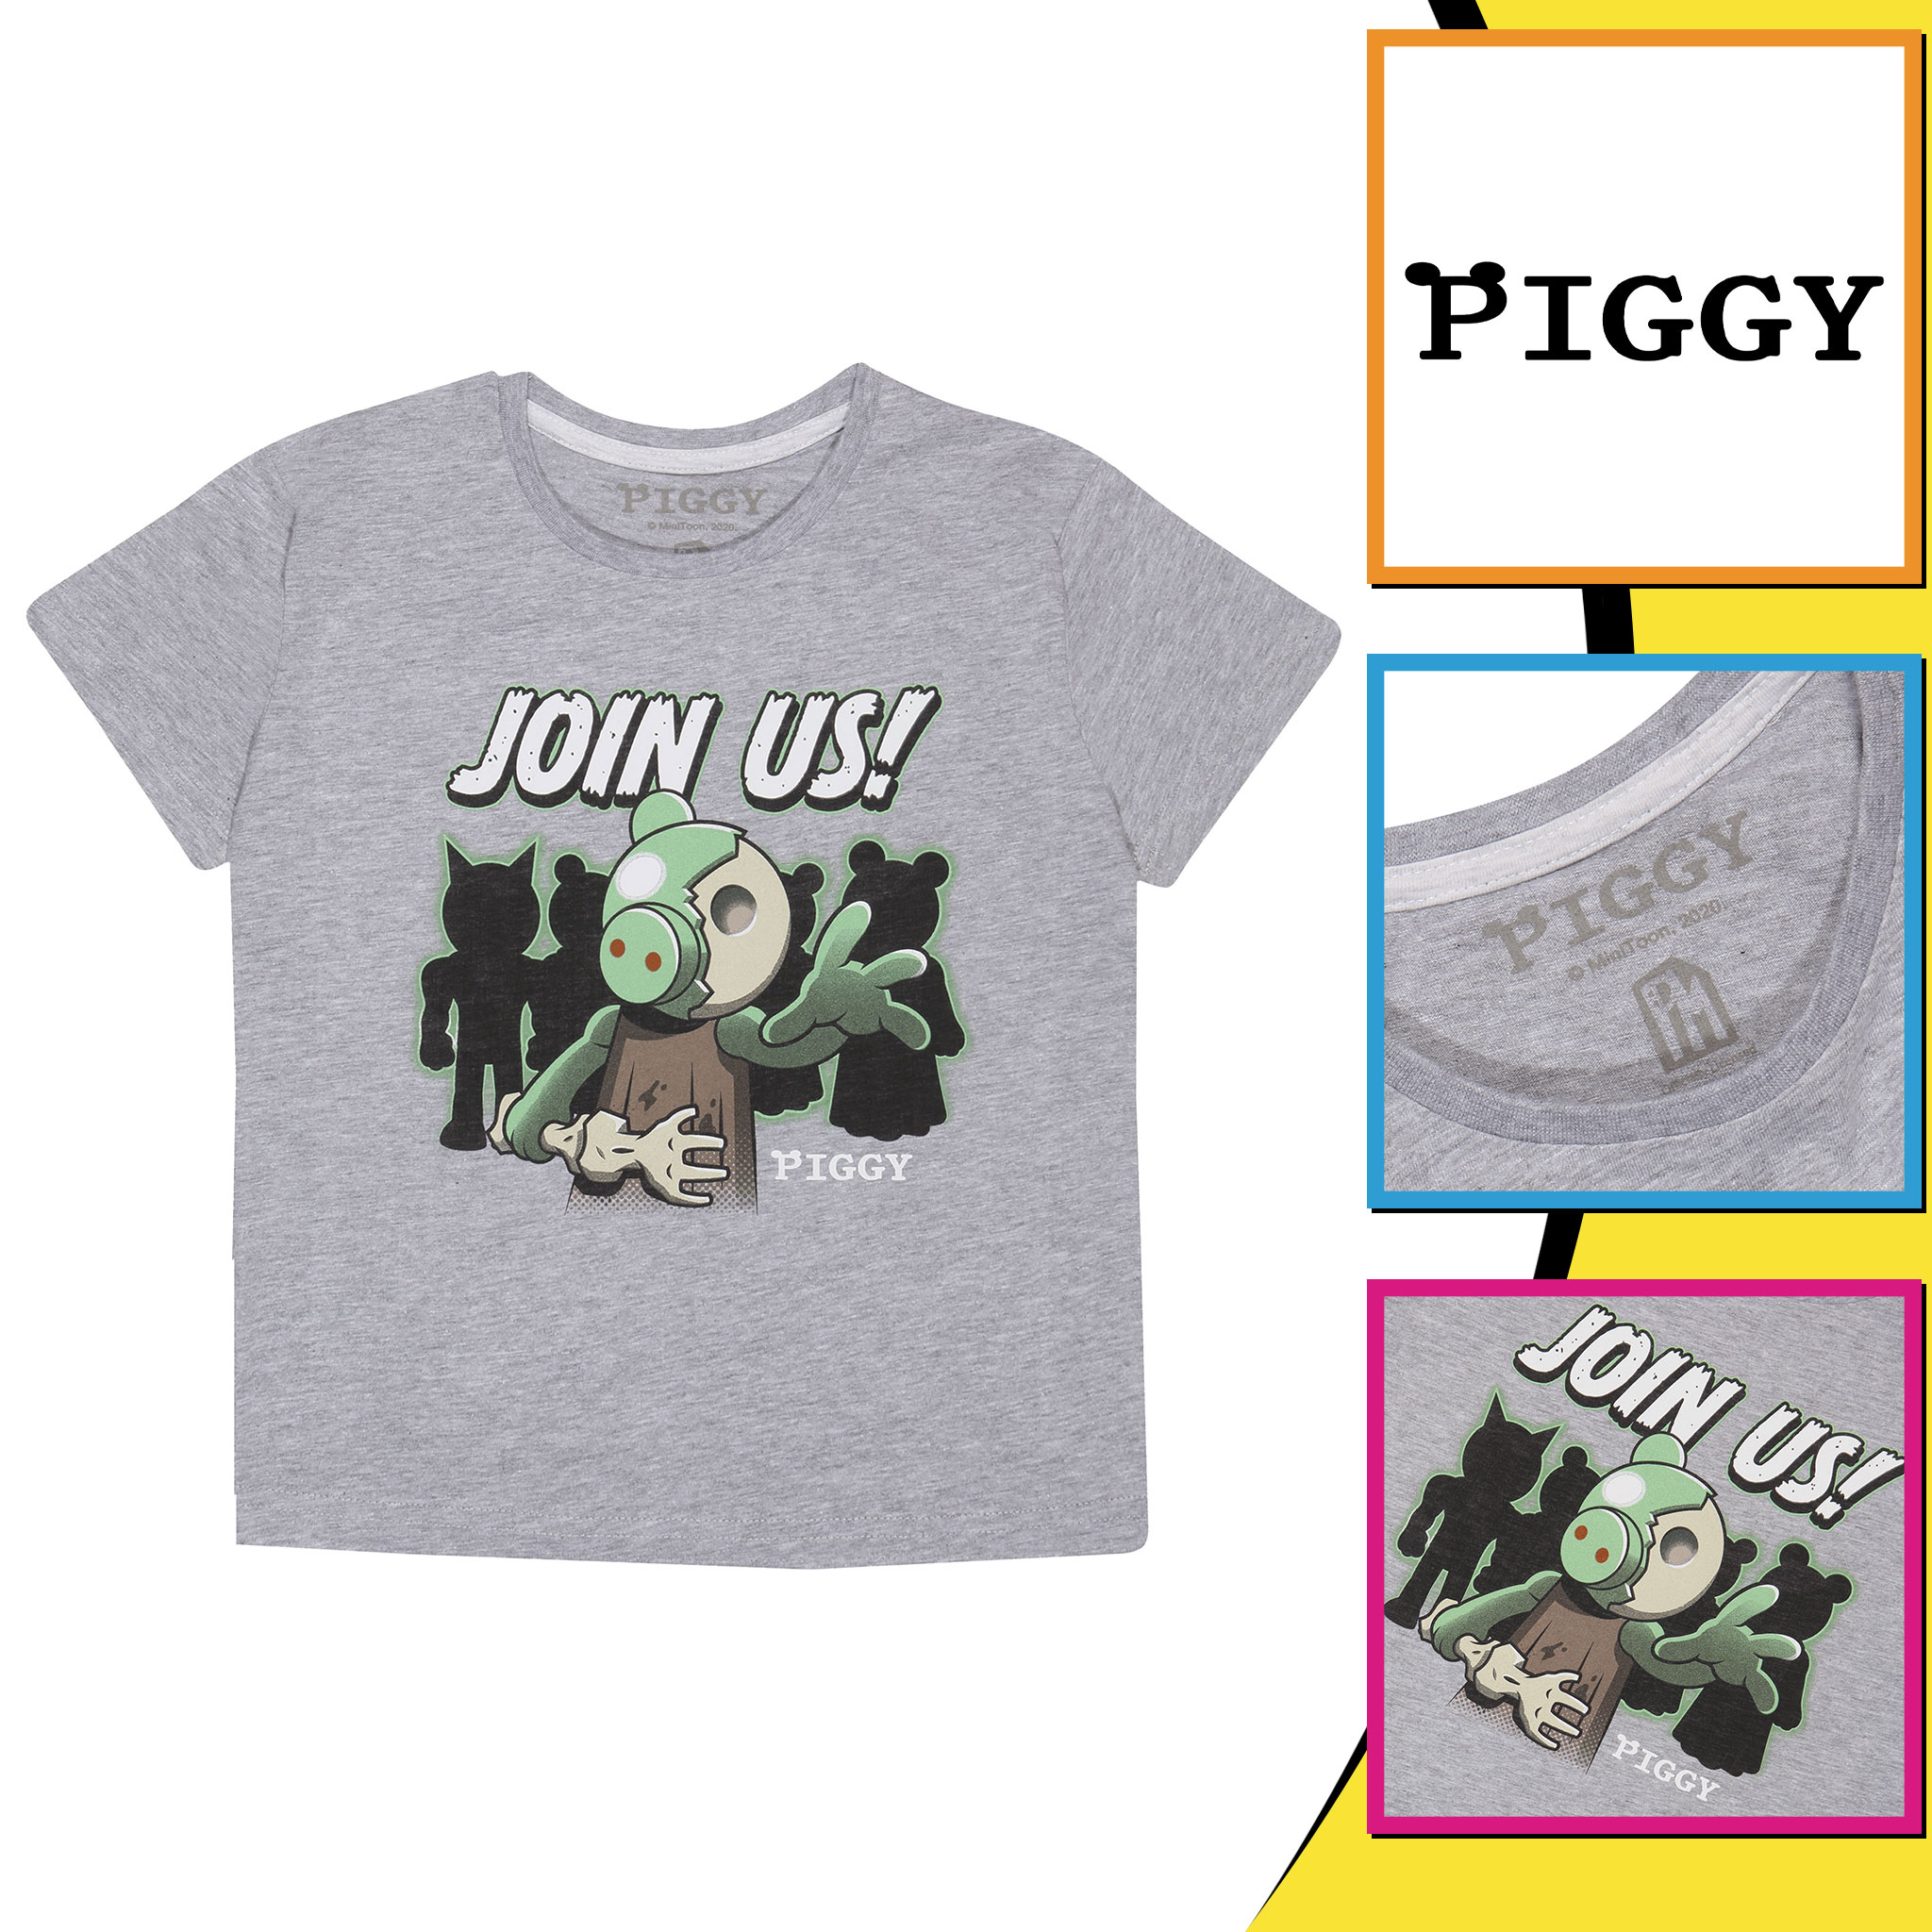 miniature 13 - Boys Piggy T Shirt Zombie Join Us Official Grey